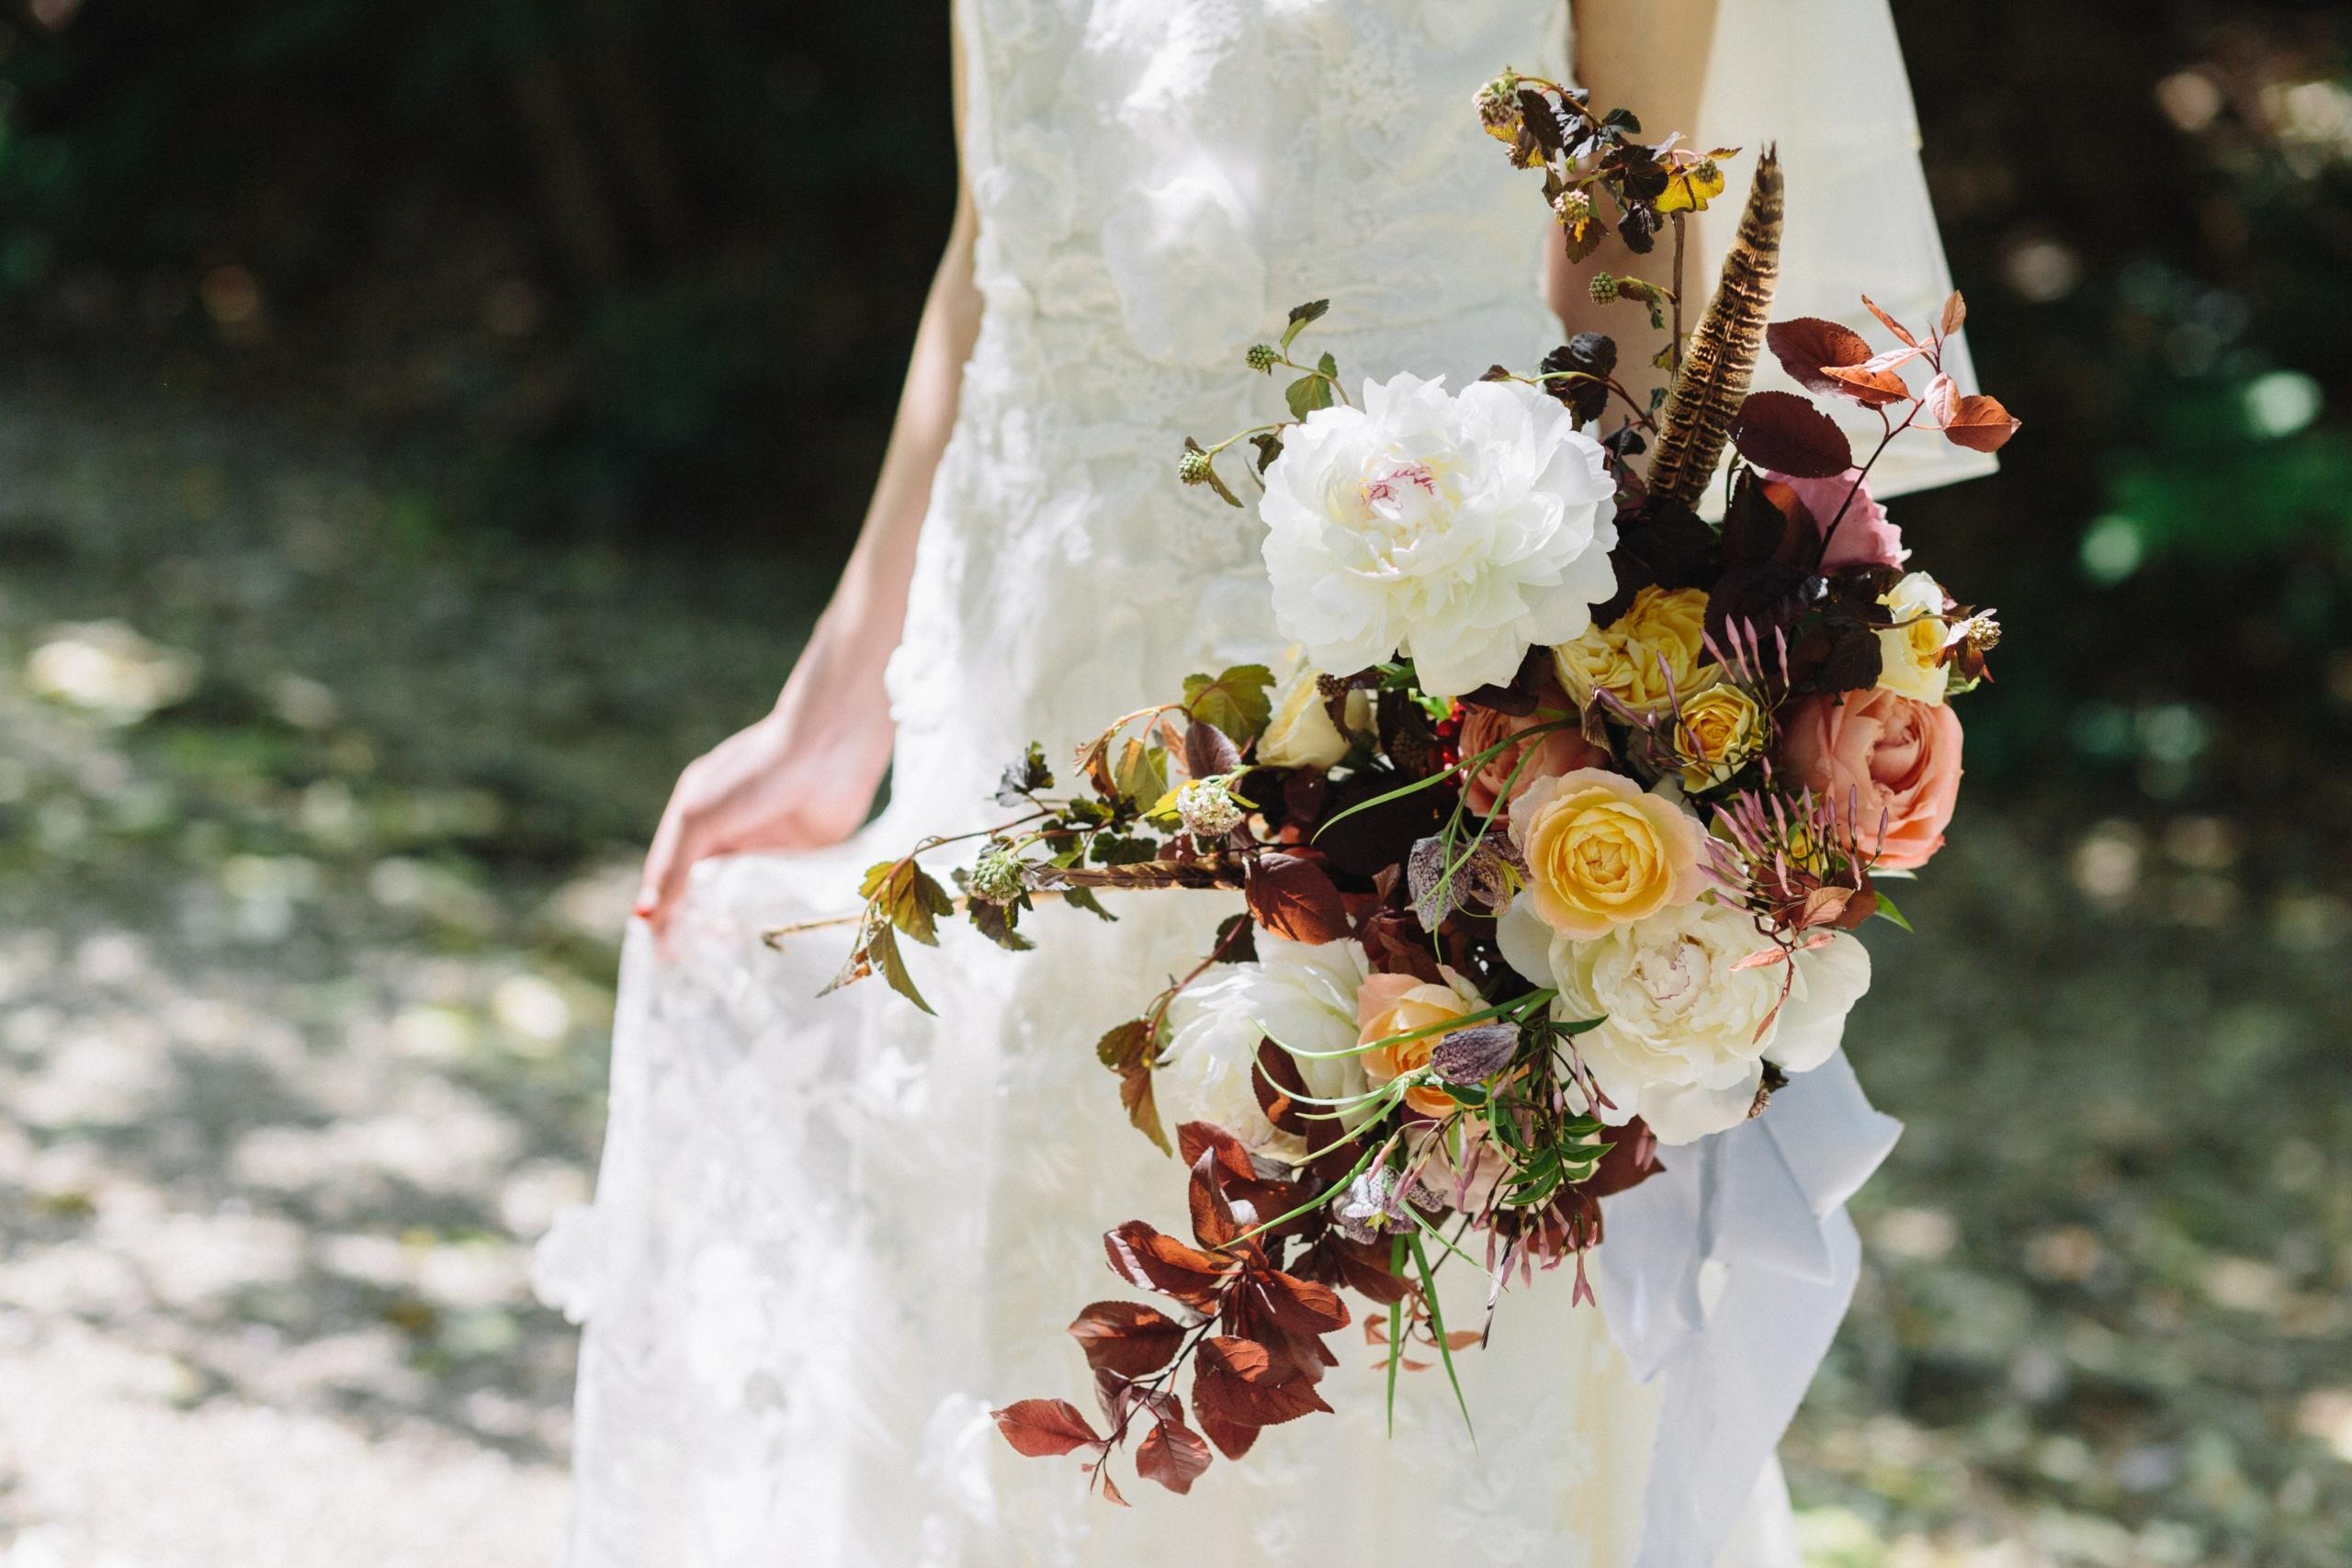 Bridal bouquet ウェディングブーケ